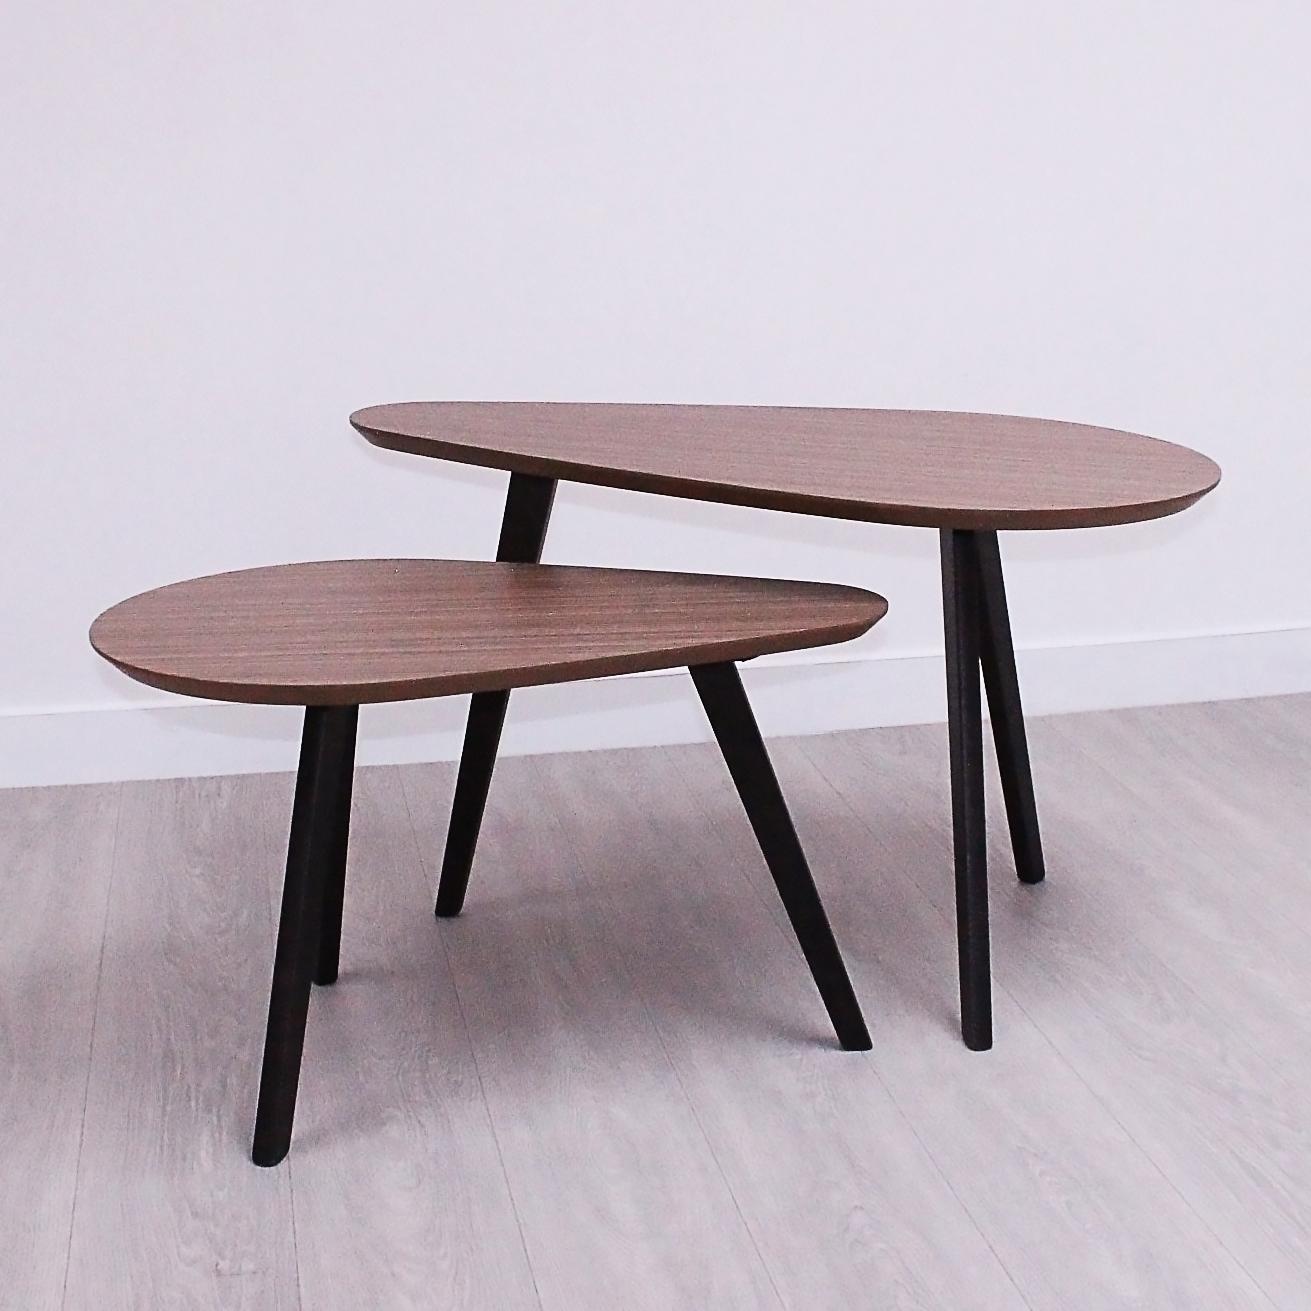 Harmony Coffee Table (double) by GVA Interiors